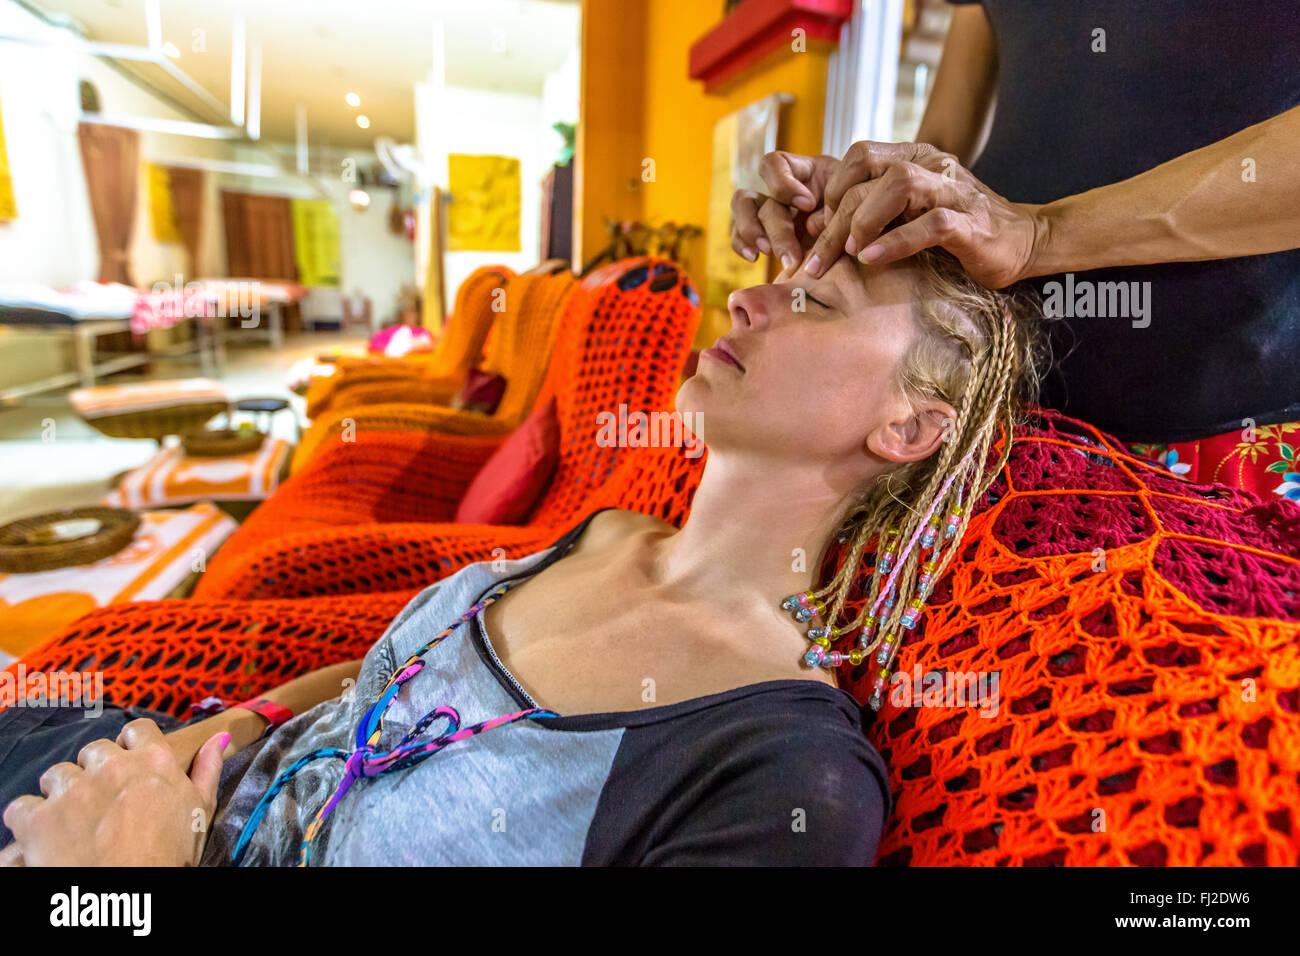 Thai facial massage - Stock Image